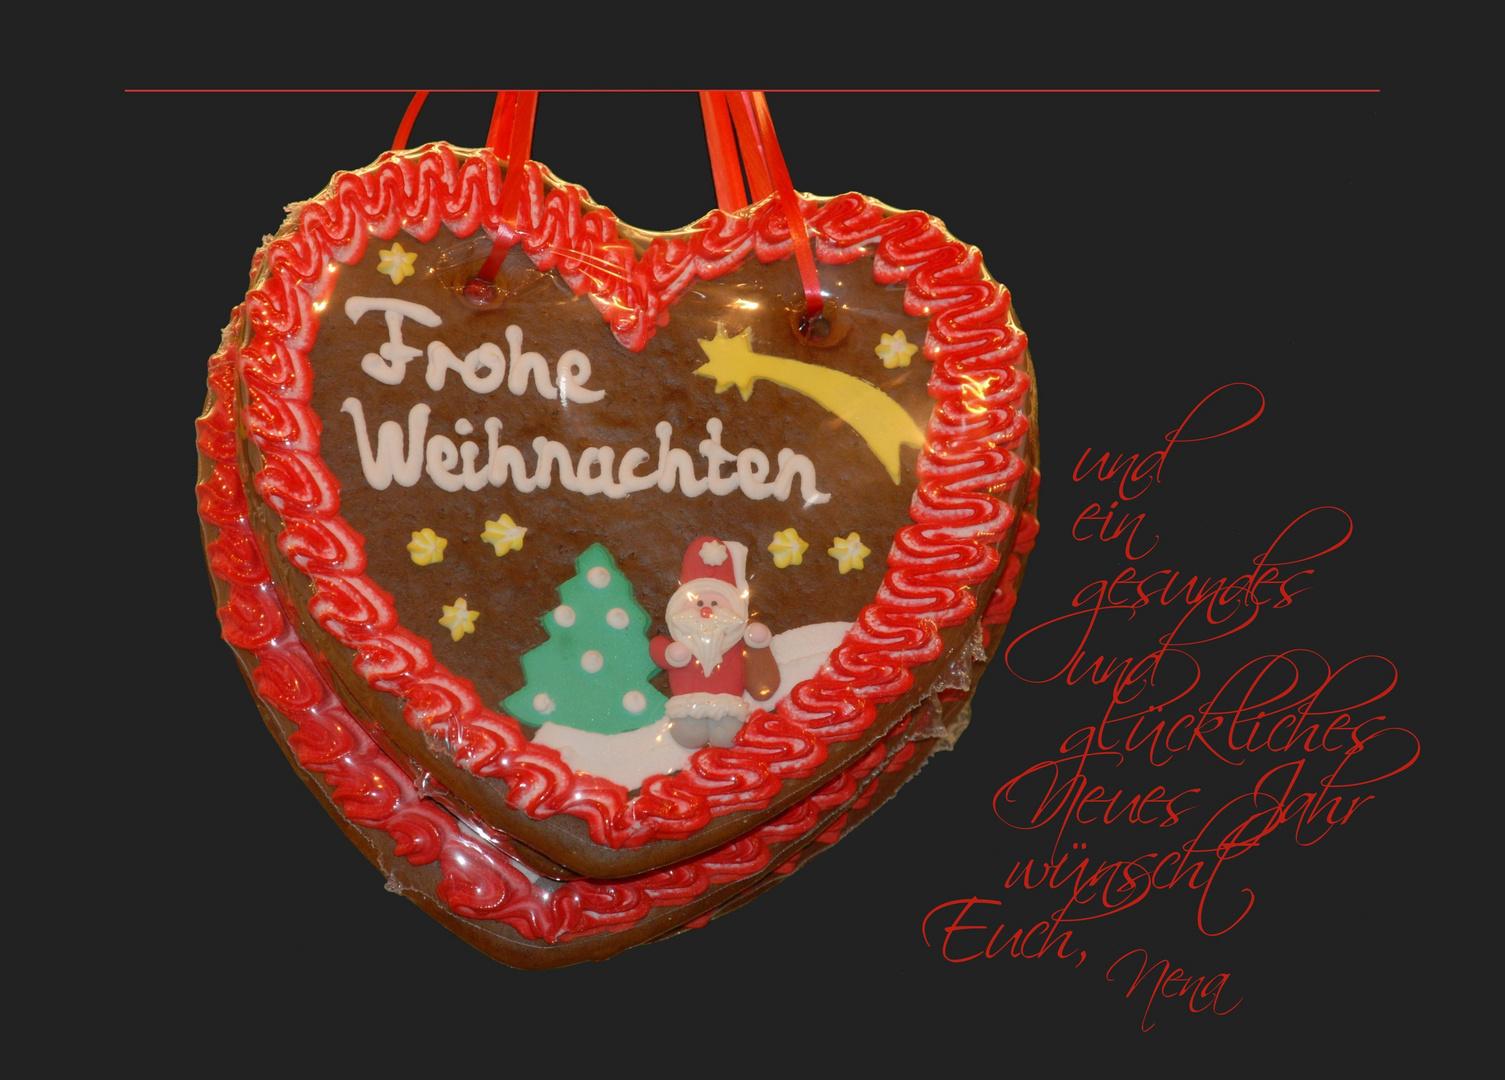 Weihnachten * Navidad * Nadal * Natale * Noël * X-mas